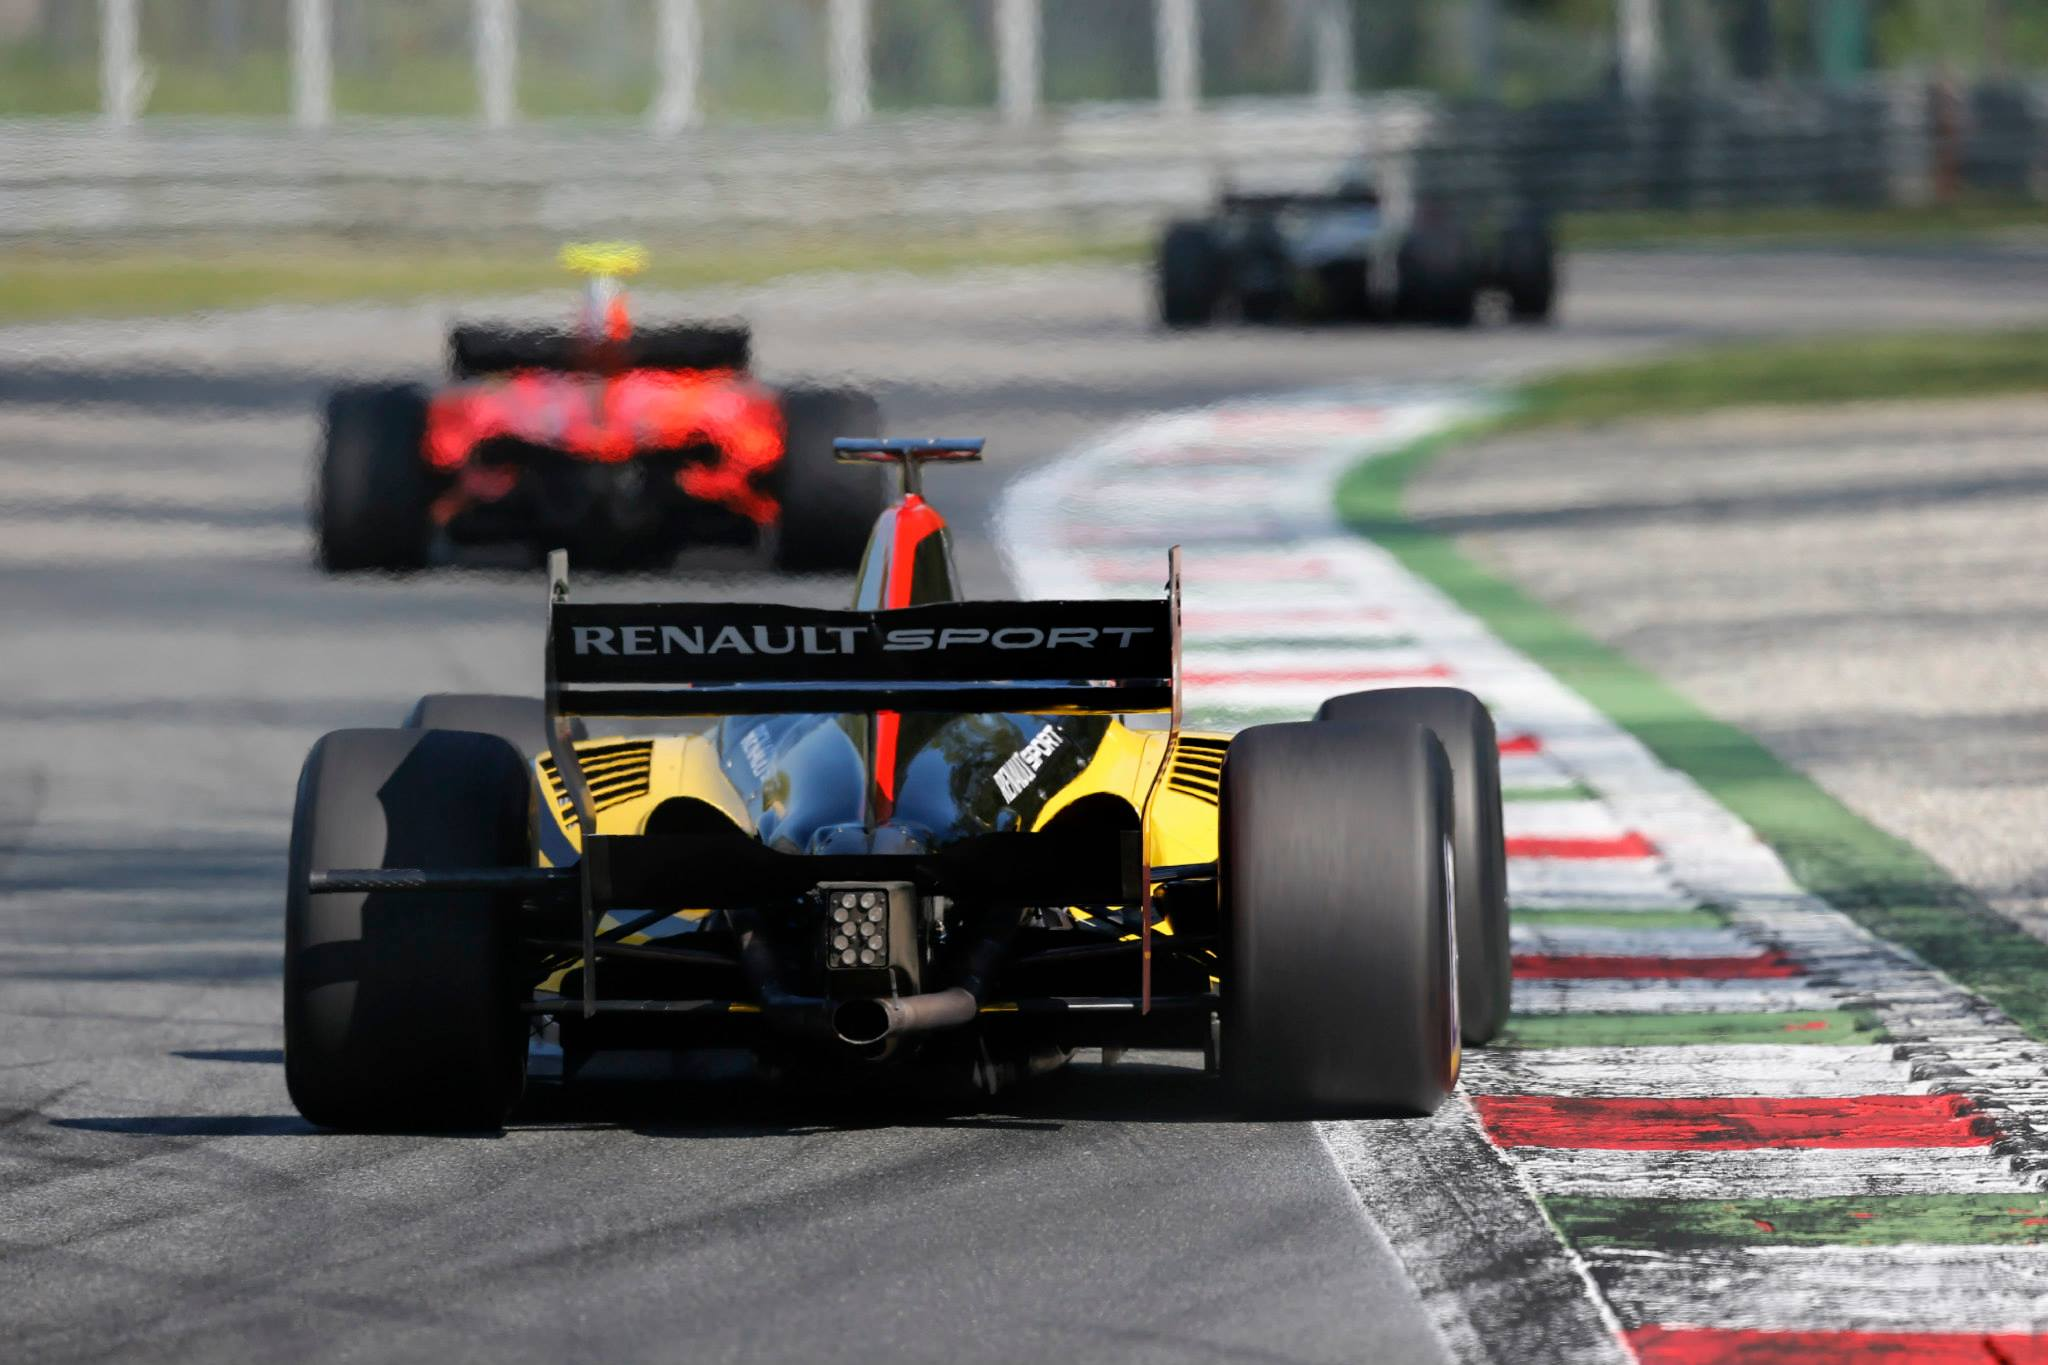 2014 Formula Renault 3.5 Series – Monza – Norman Nato